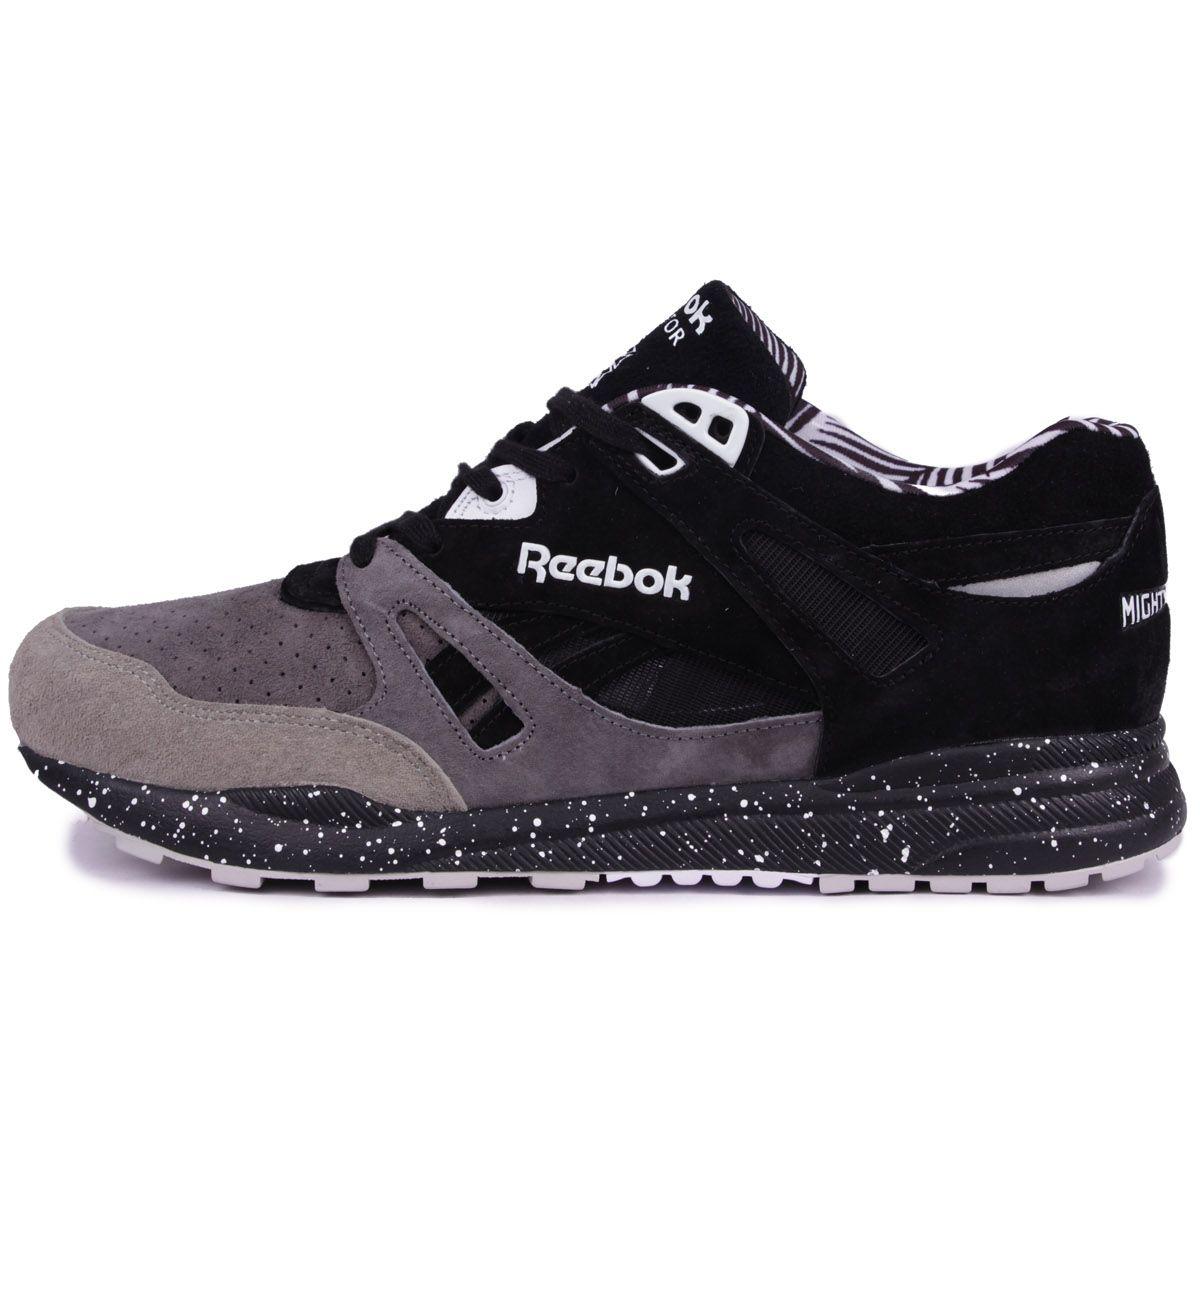 new reebok shoes 2016 tunisie valeurs netgear